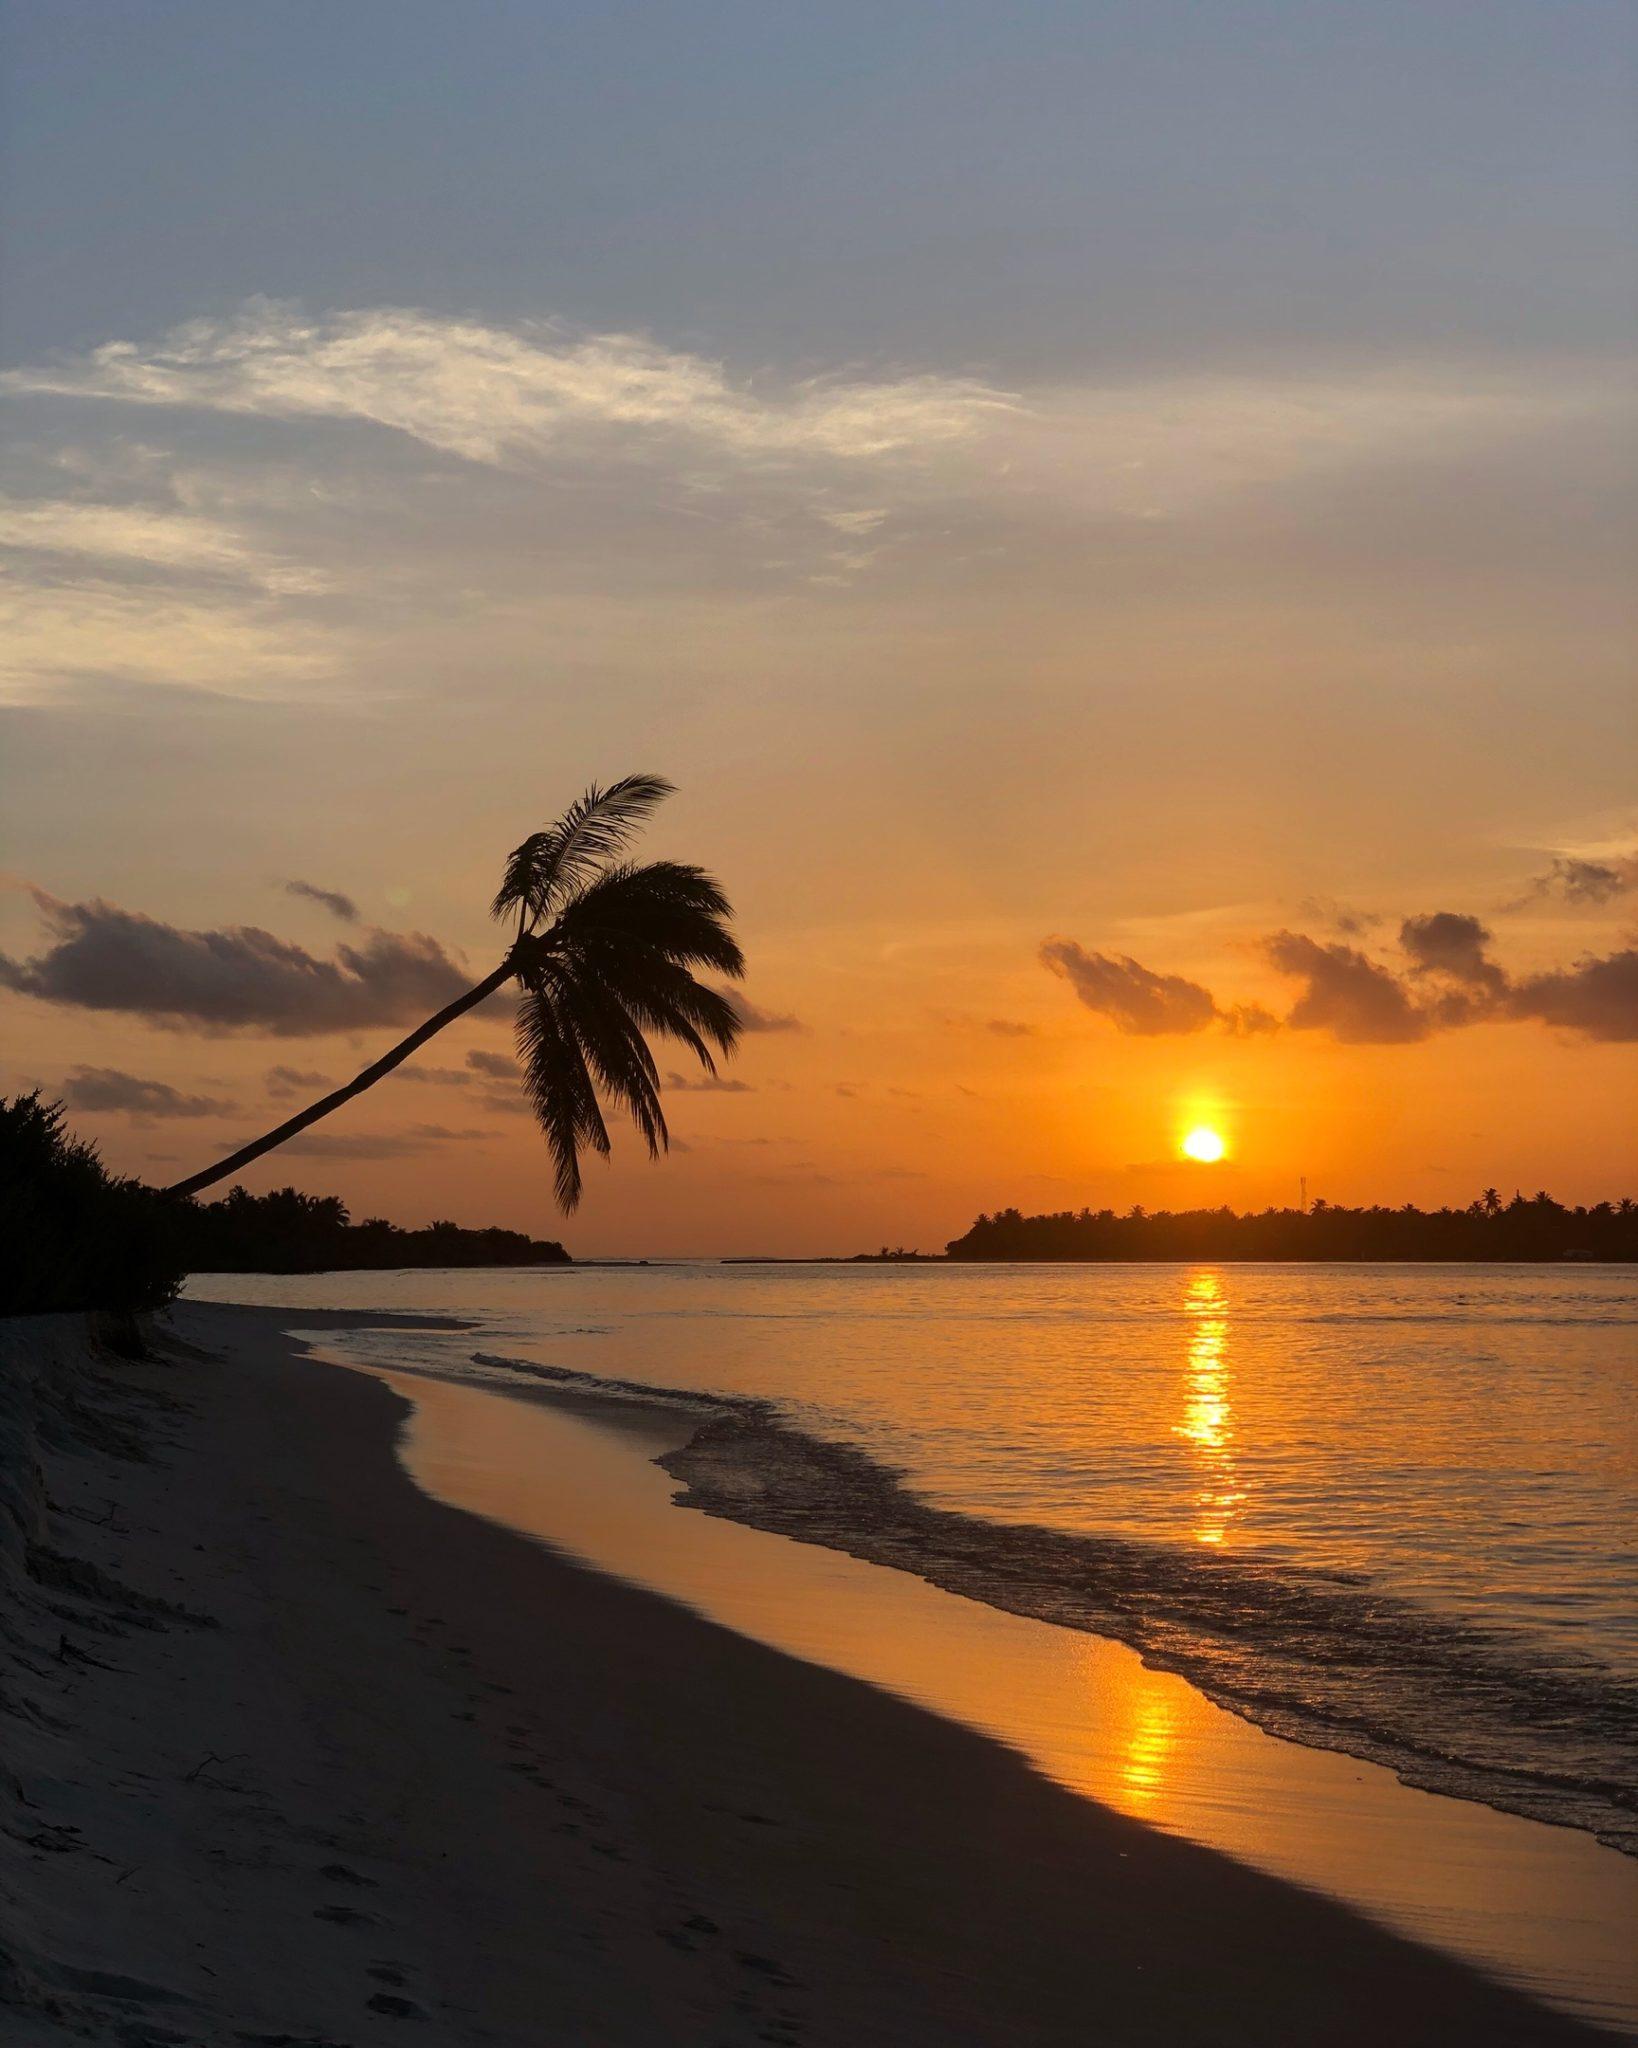 Sun island resort and spa, Maldives